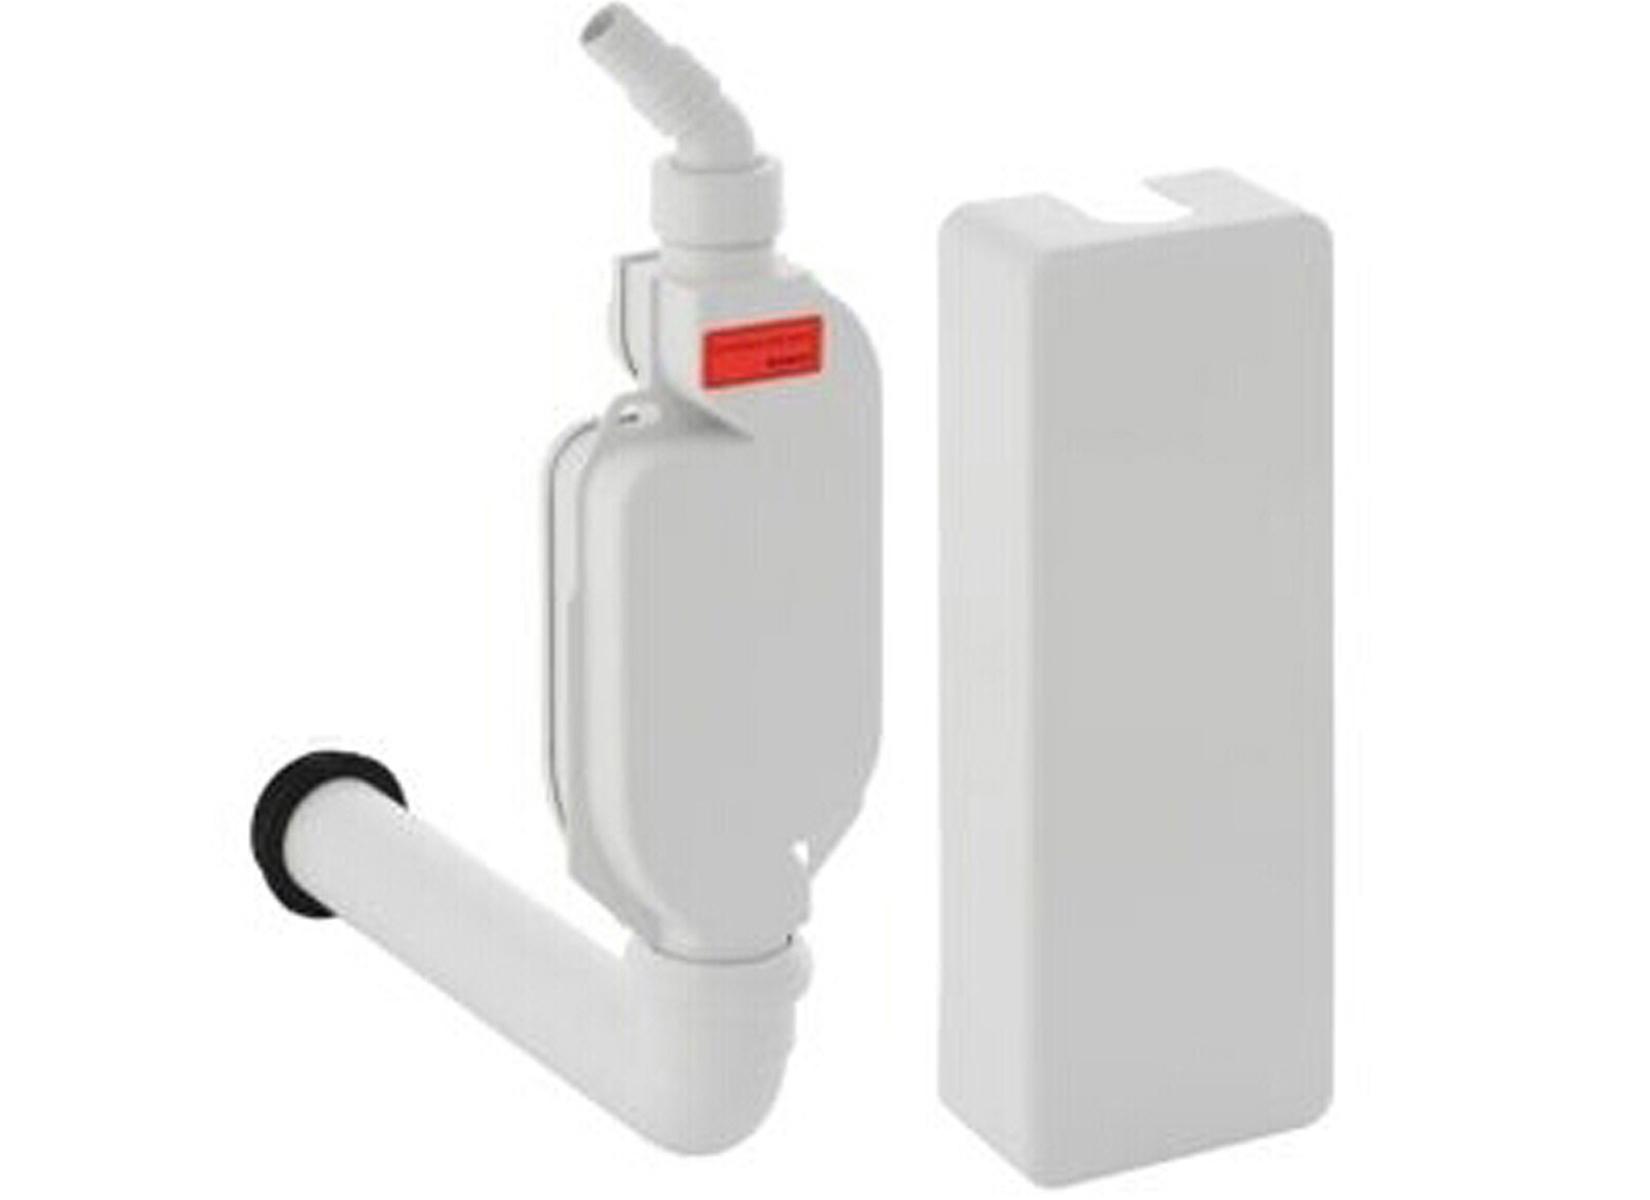 geberit waschmaschine aufputz siphon 40 mm sifon waschger te ger tesiphon ebay. Black Bedroom Furniture Sets. Home Design Ideas